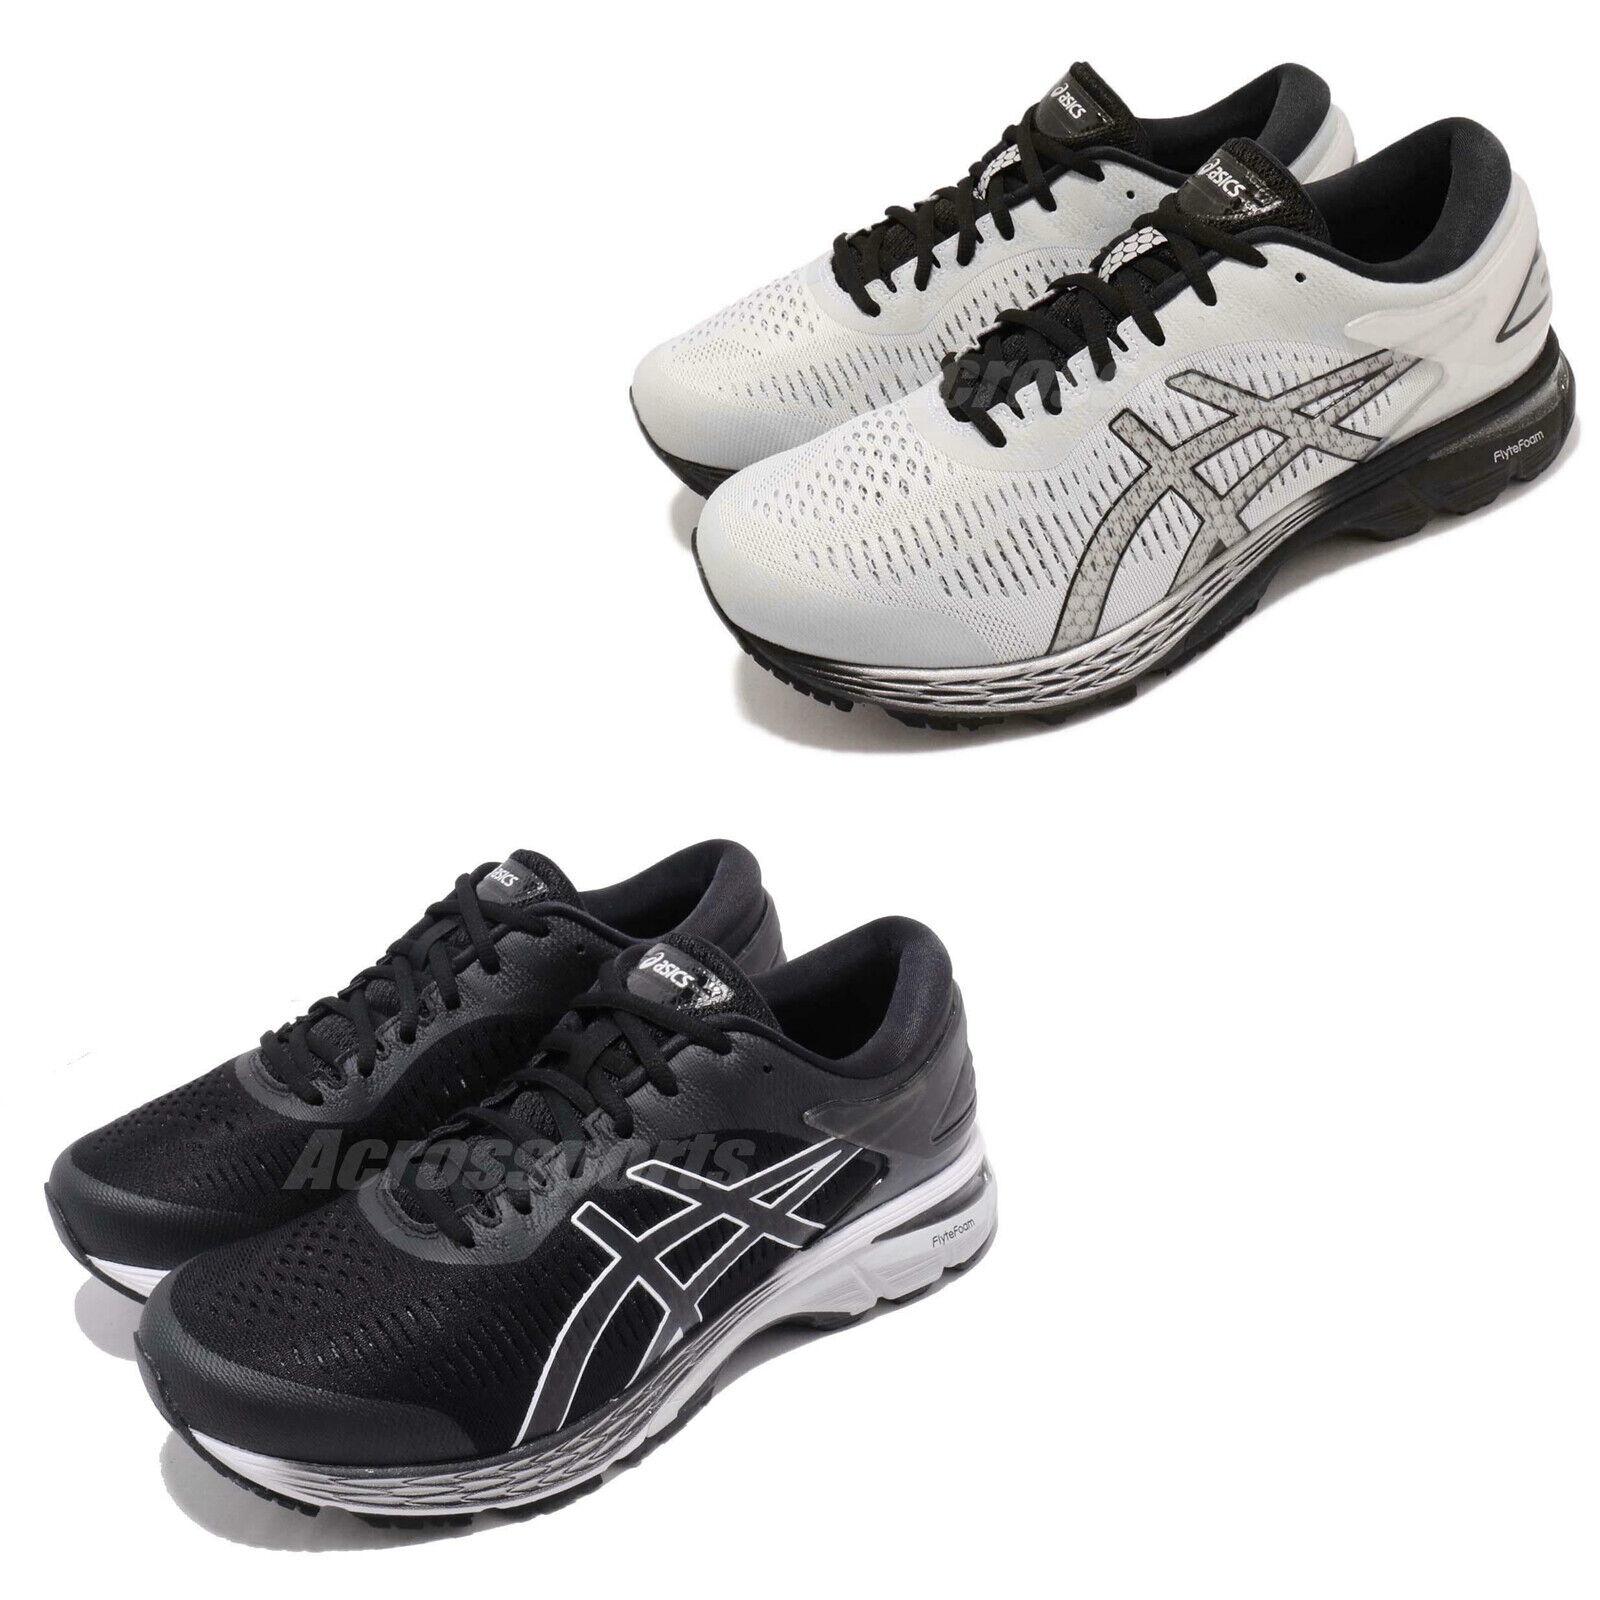 Asics Gel Kayano 25 4E Extra Wide Men Running chaussures baskets Pick 1